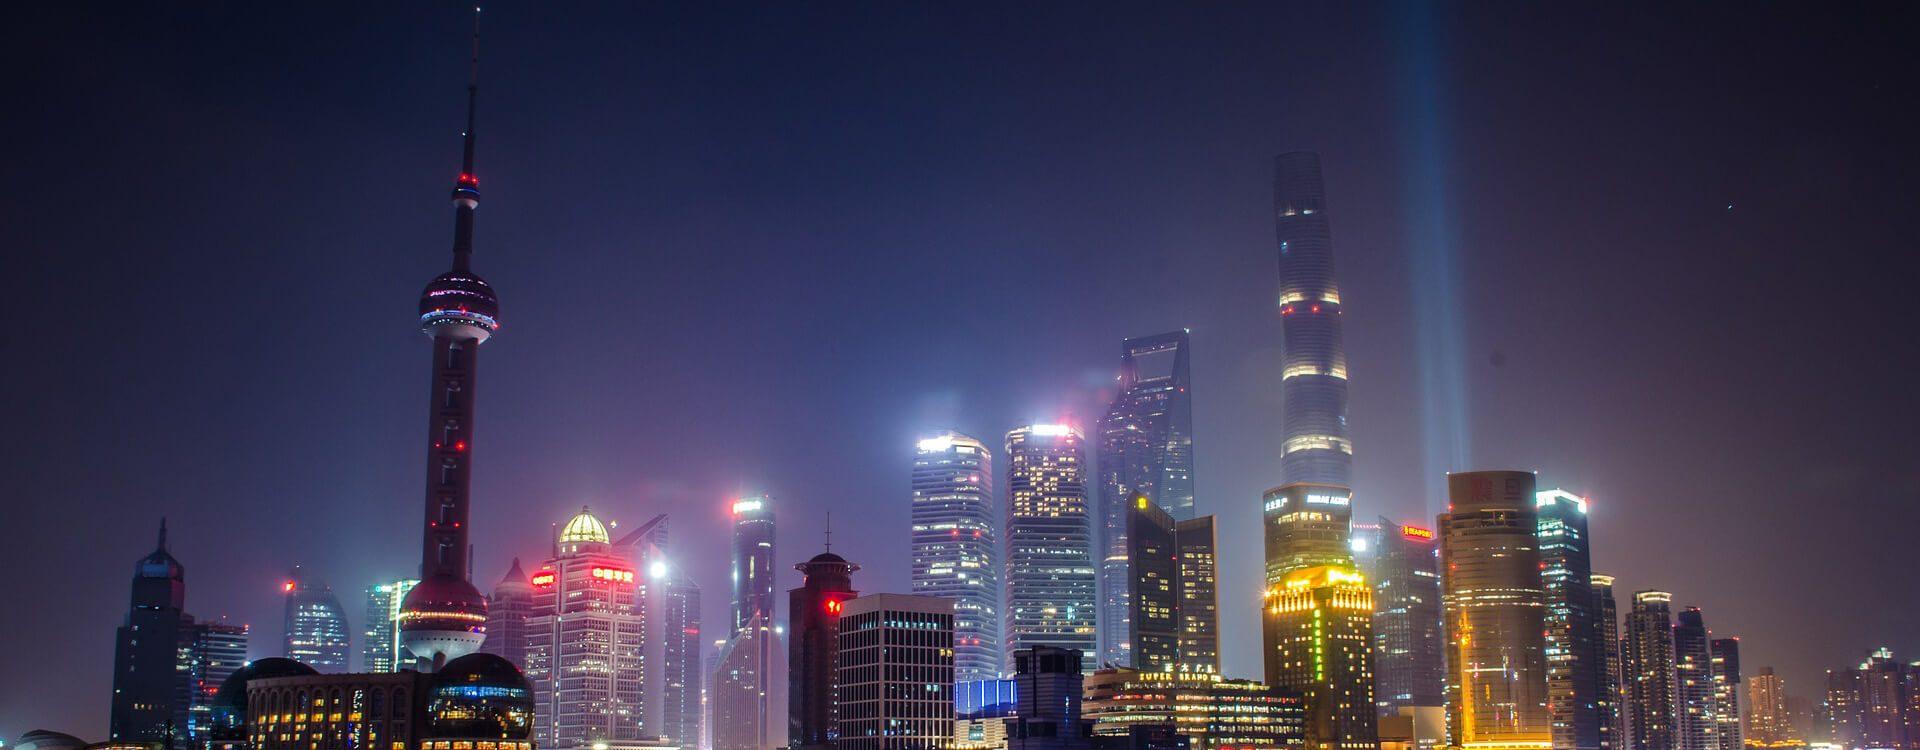 Promotional Centre - Locations - Shanghai